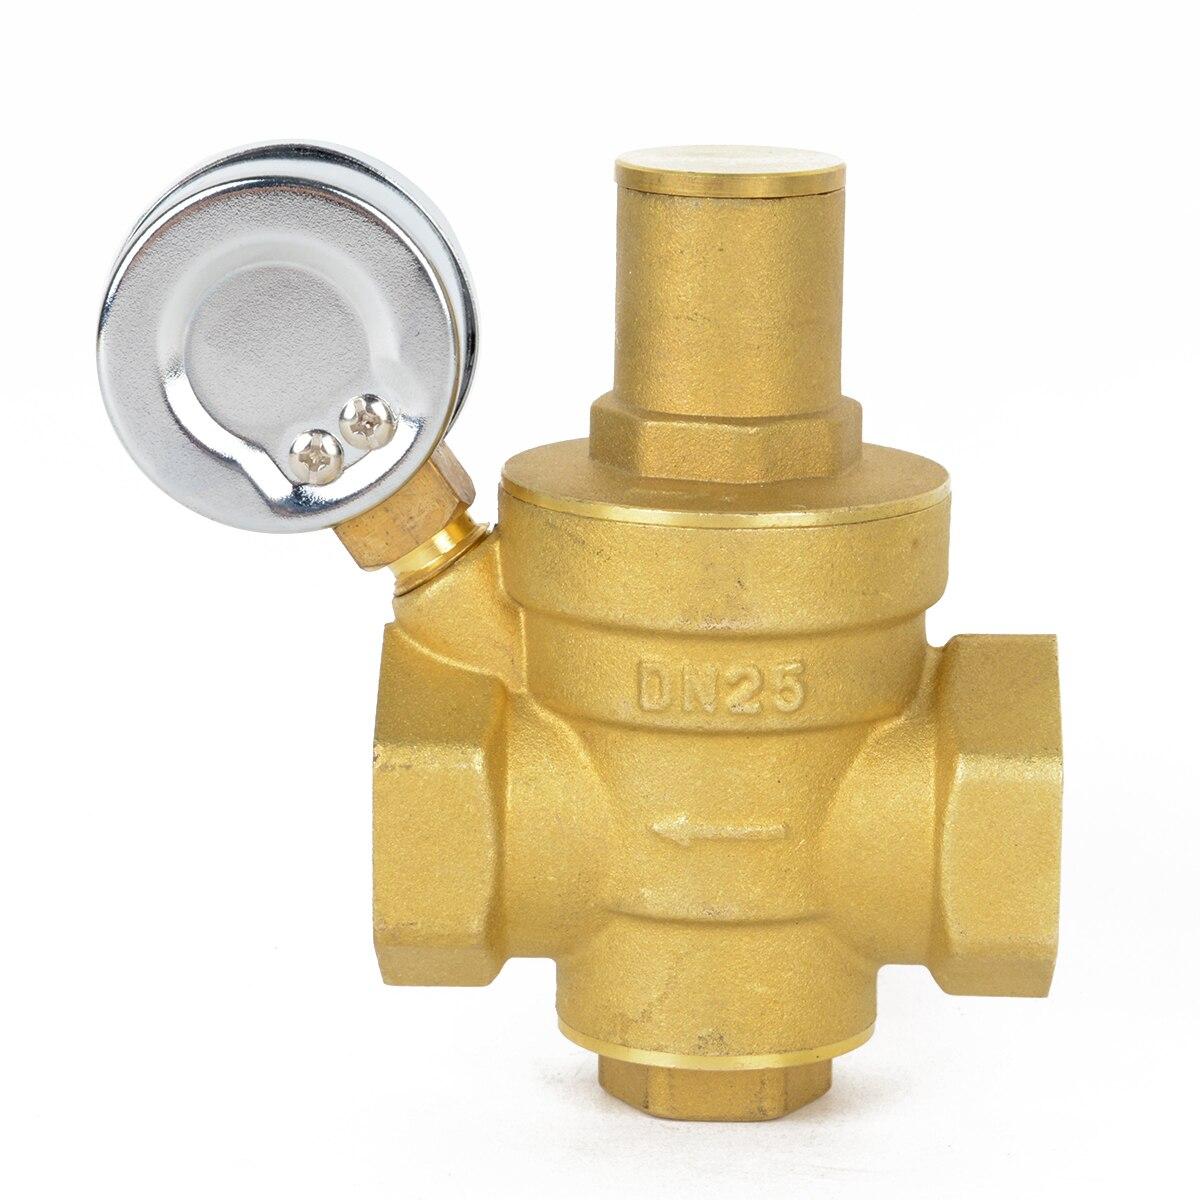 "Brass DN15 Water Pressure Reducing Valve 1/2"" NPT With Gauge Meter Mayitr Adjustable"